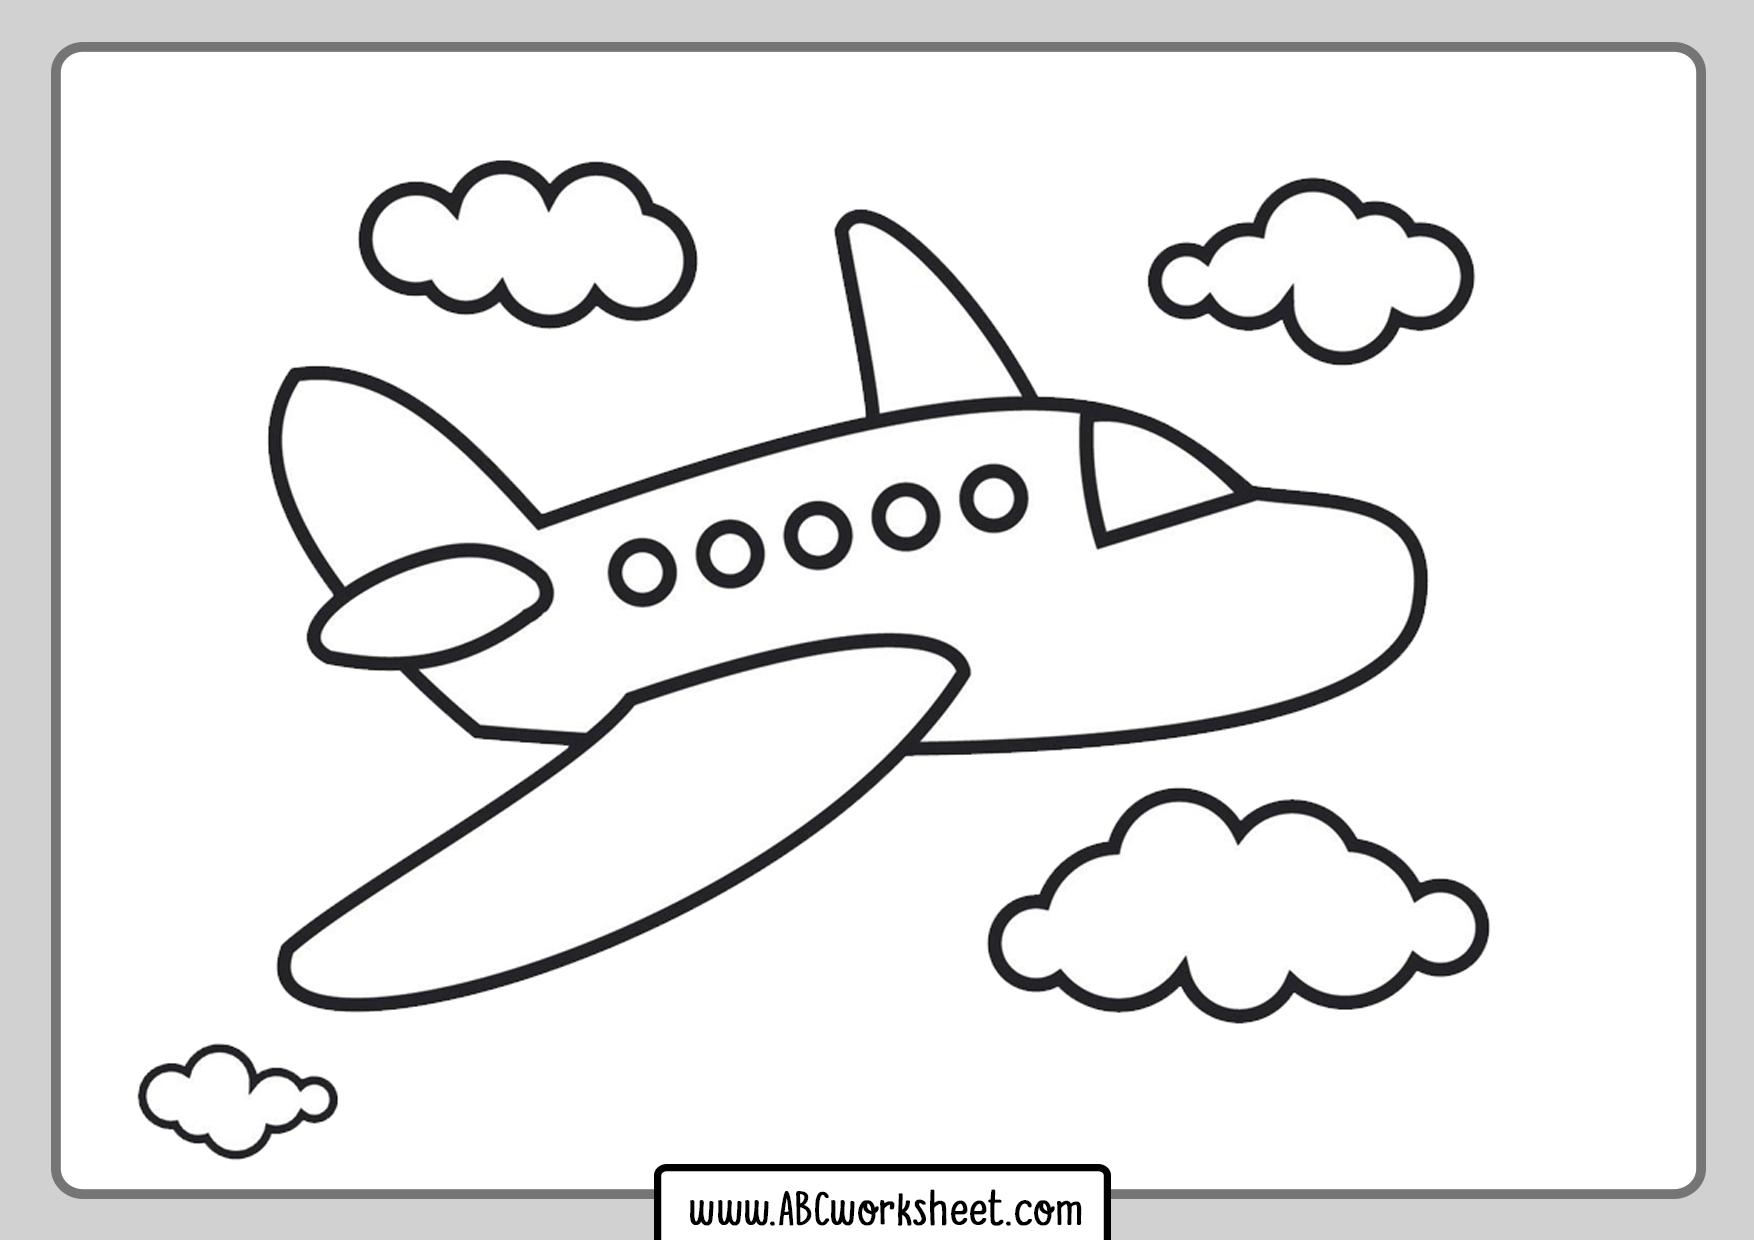 Kindergarten Airplane Coloring Page